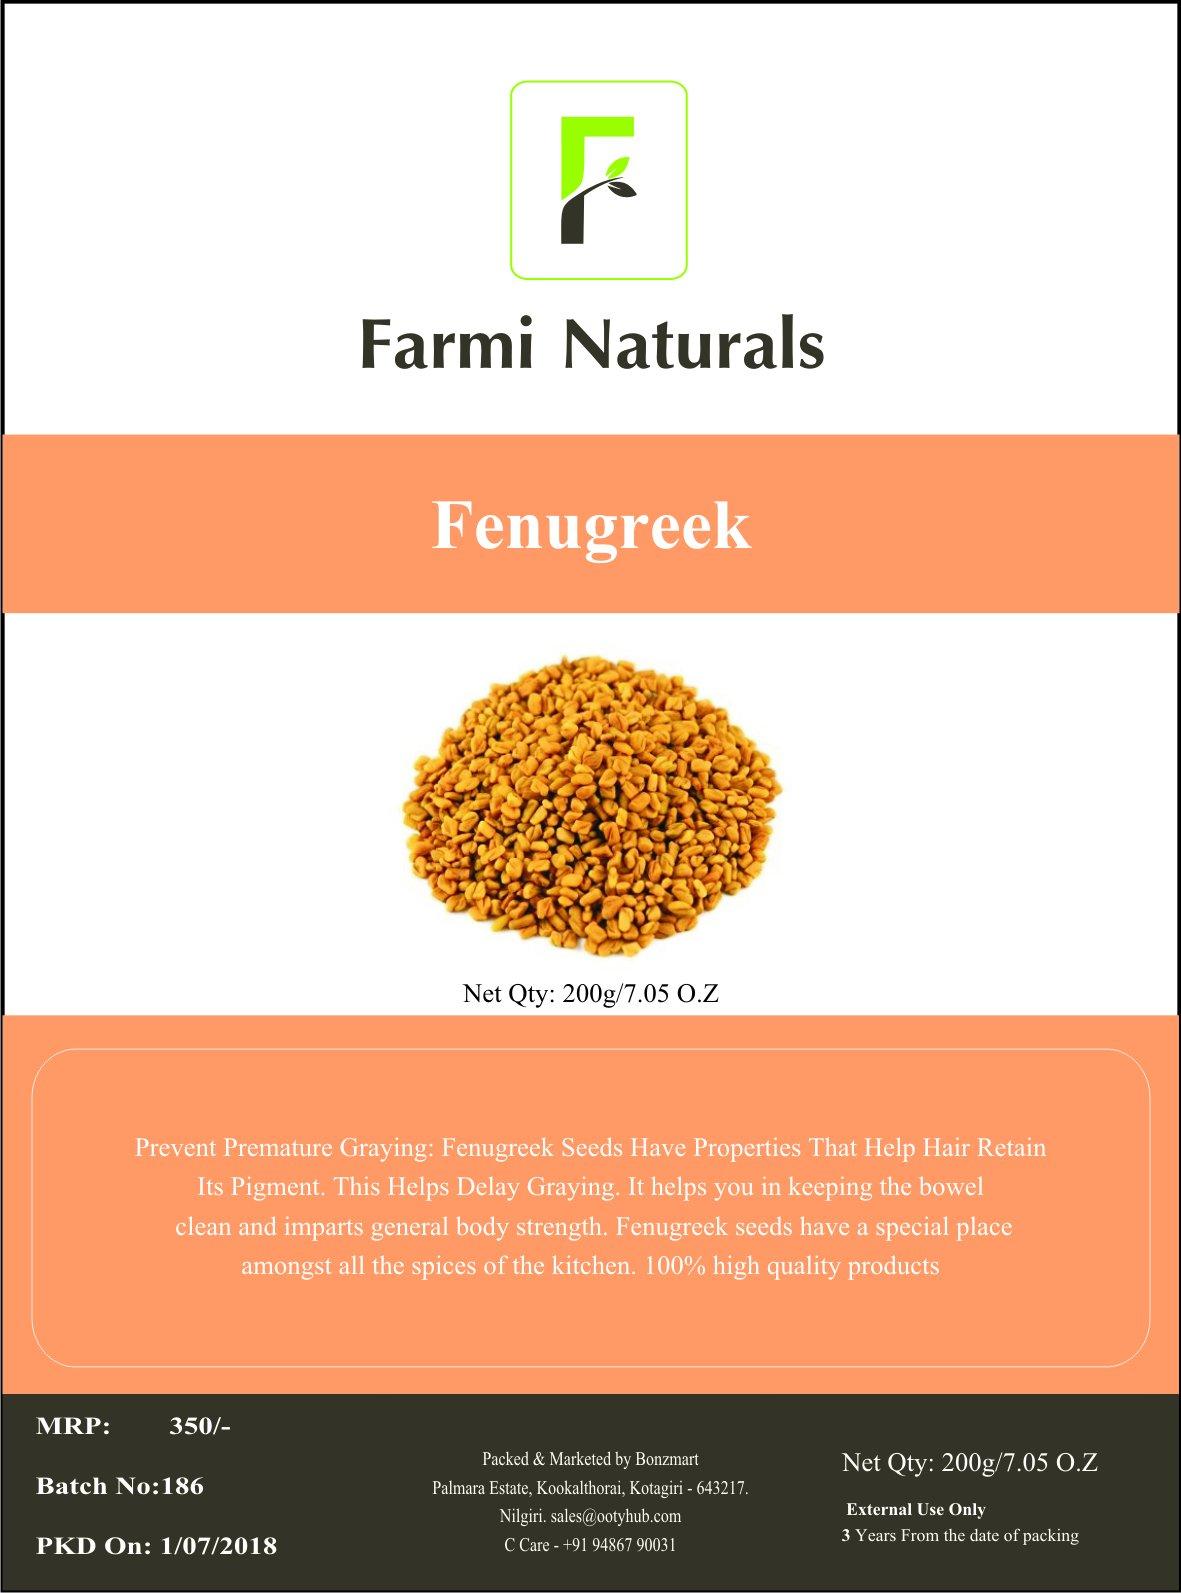 Fenugreek Seed Indian Spices - 200g,Trigonella foenum-graecum, Methi